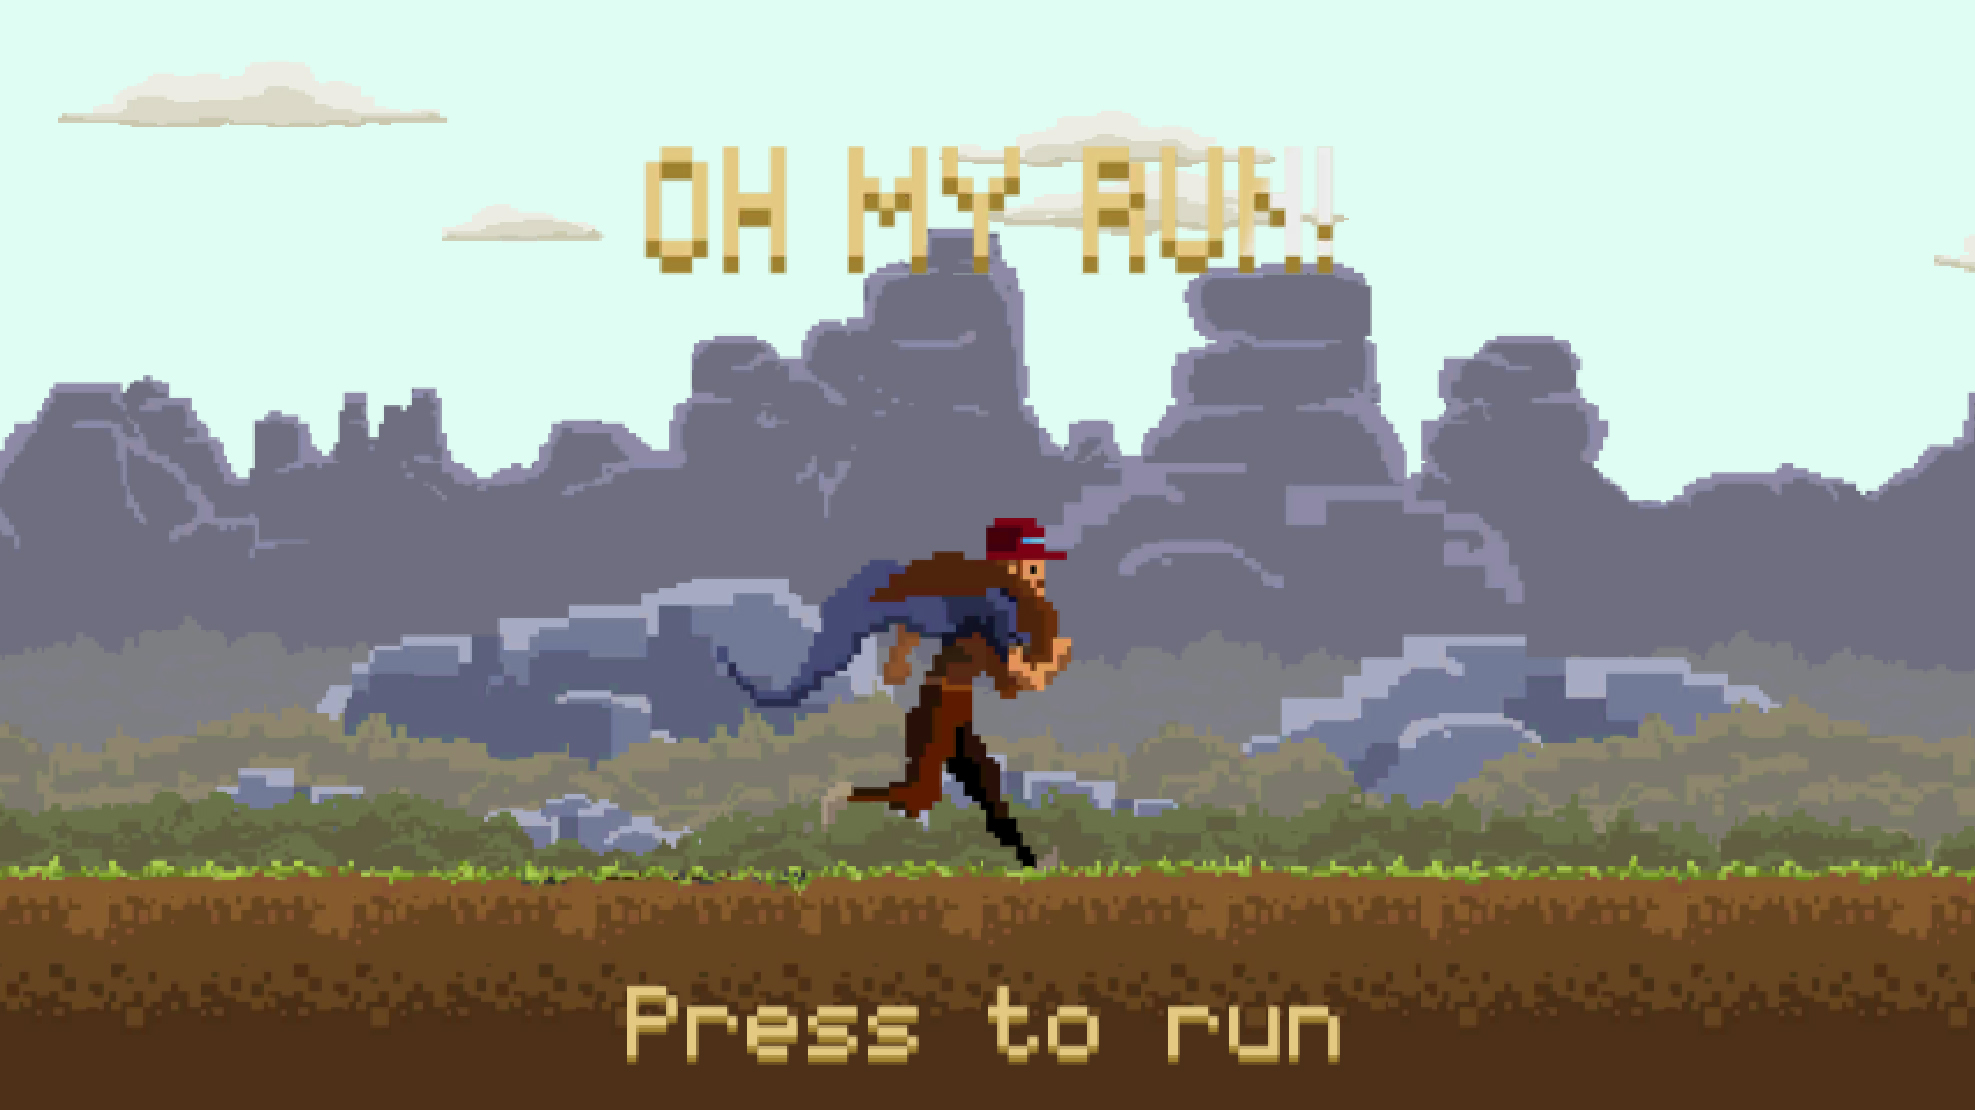 Oh my run!